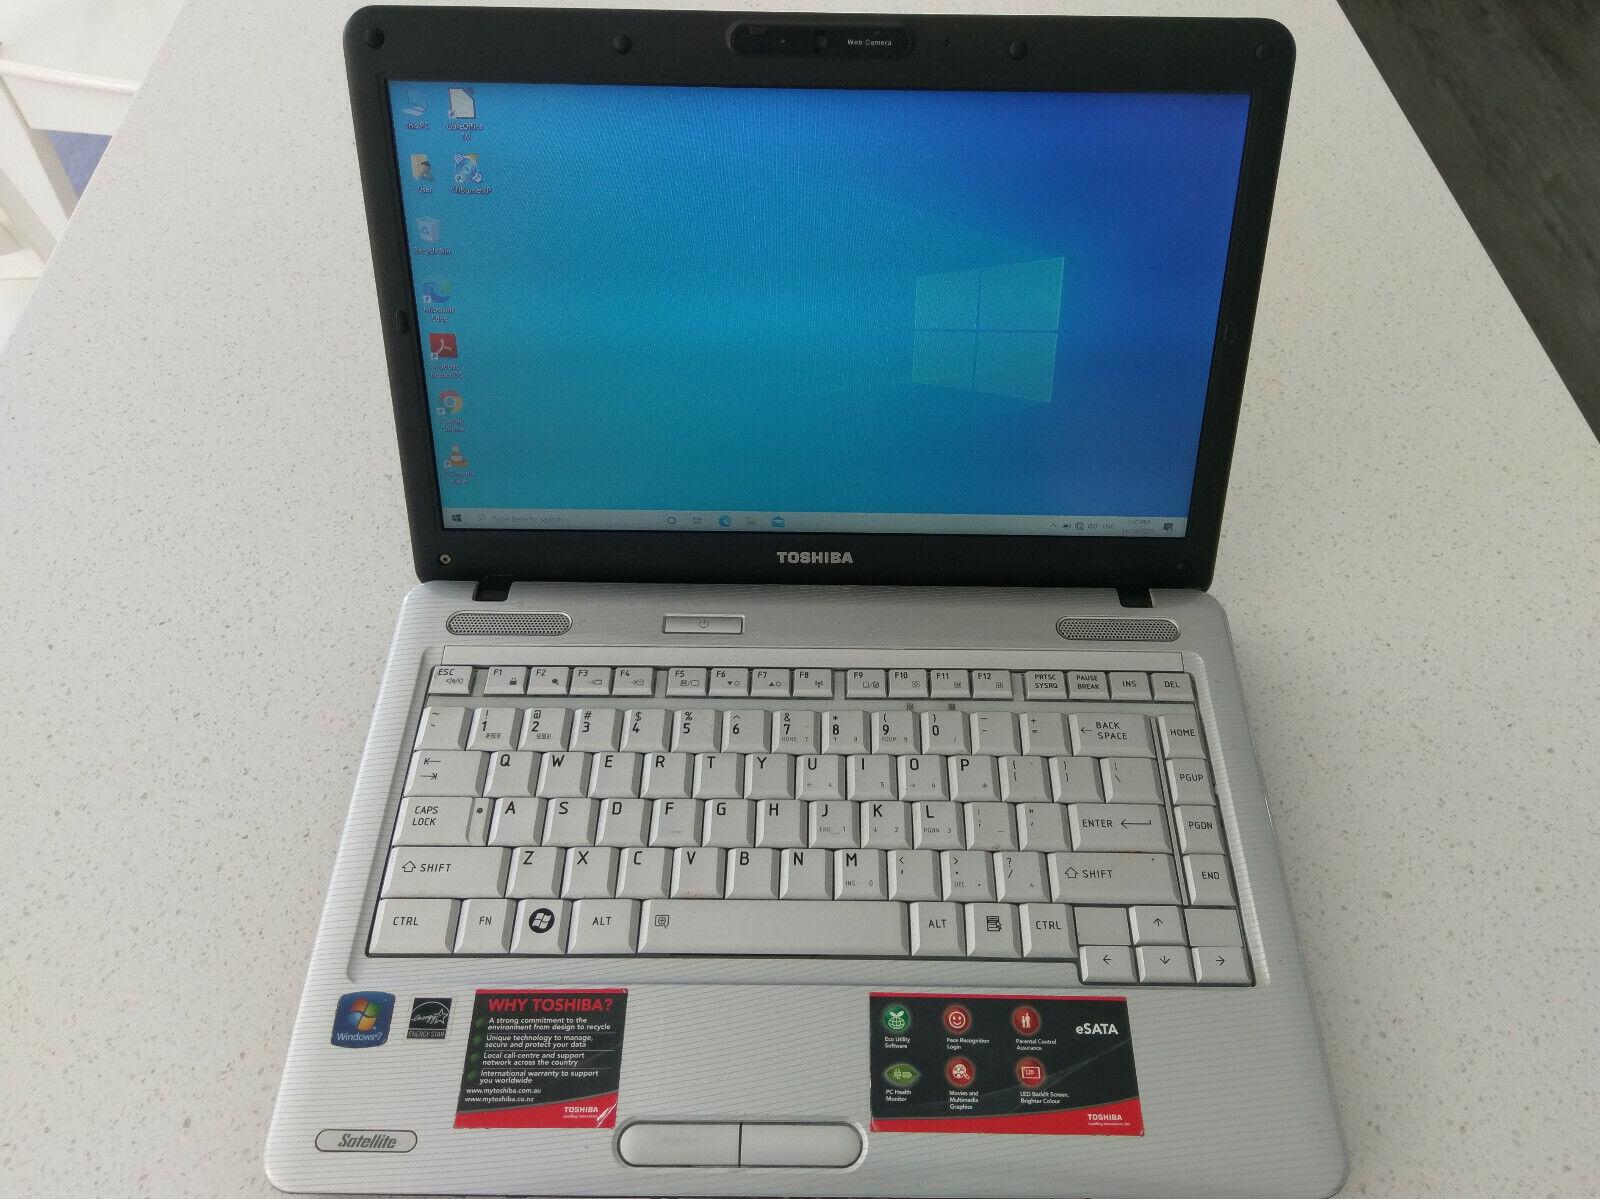 Laptop Windows - Toshiba Satellite L510 Laptop - Core 2 Duo T9300, 4GB RAM, 240GB SSD, Windows 10